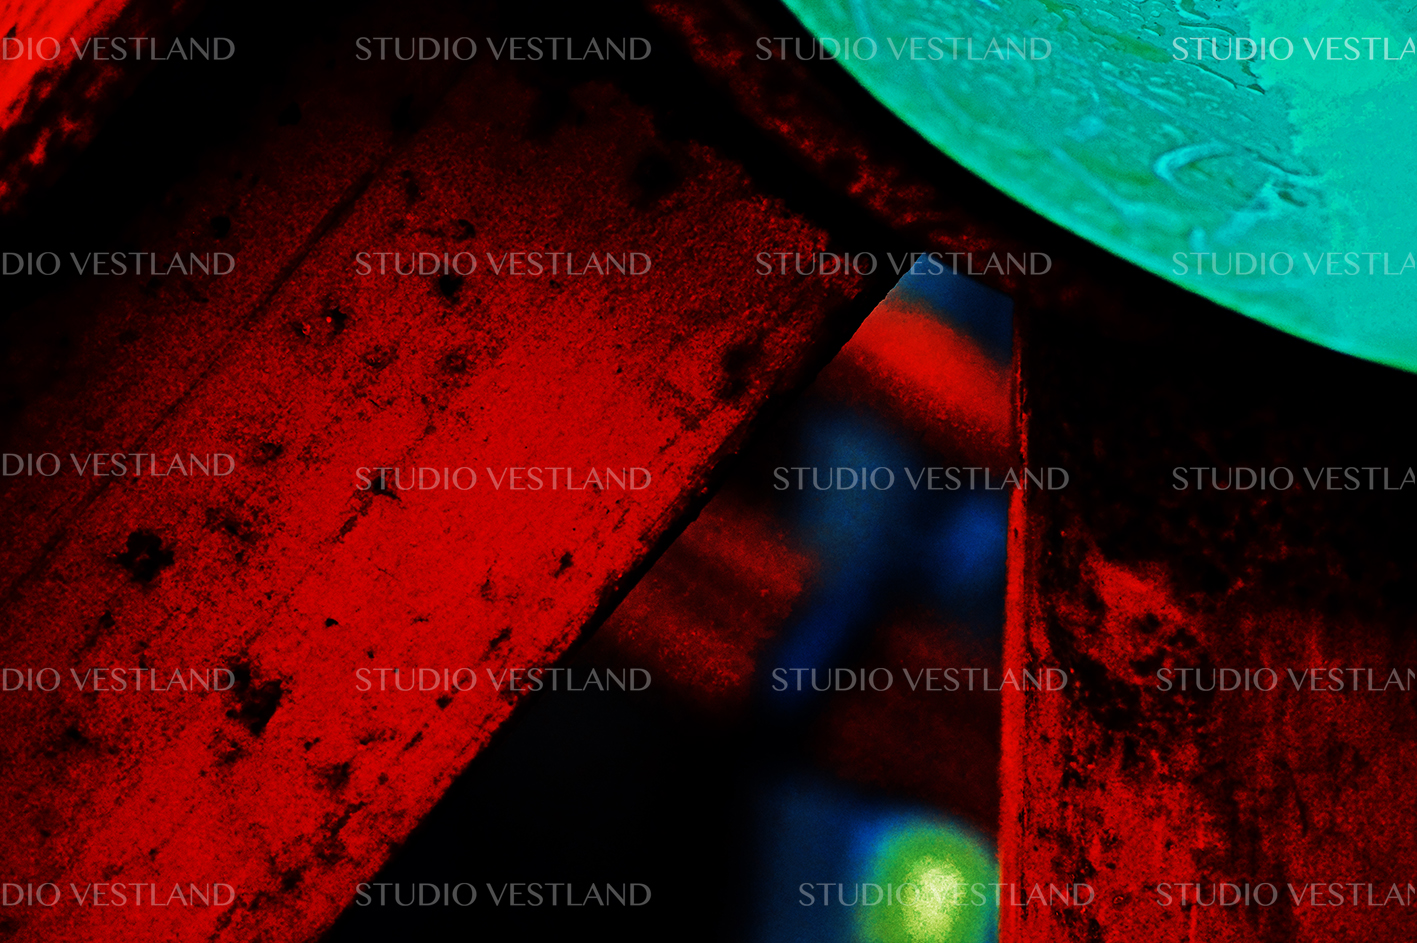 Studio Vestland - Sperre 03